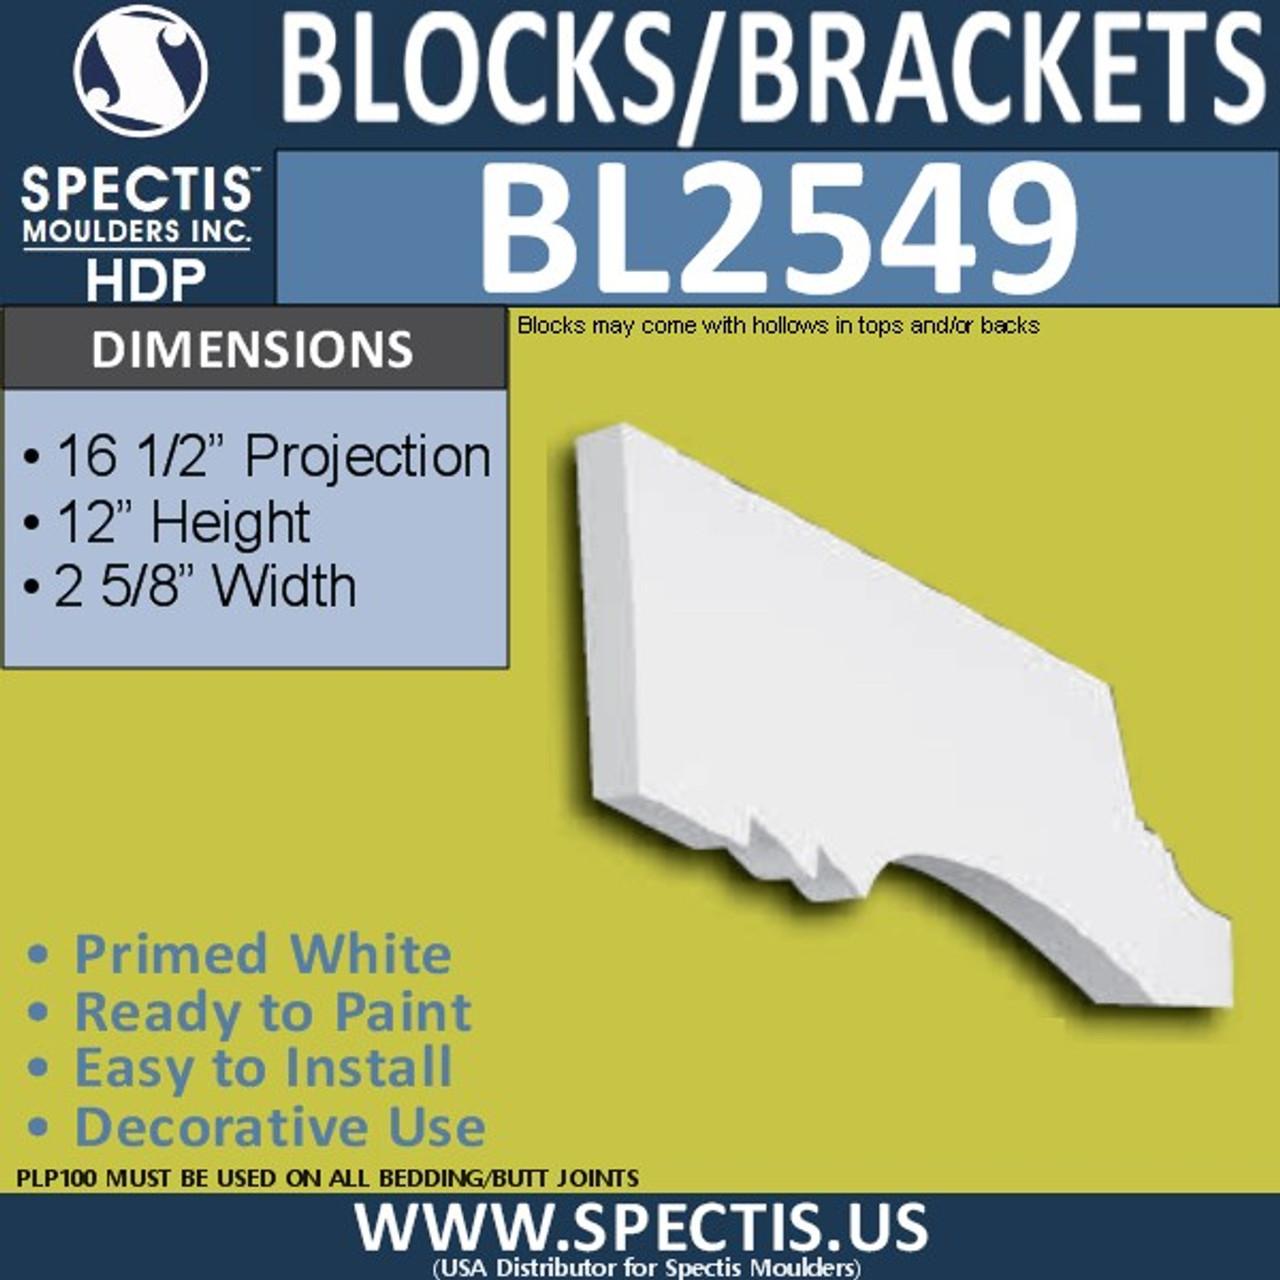 "BL2549 Eave Block or Bracket 2.5""W x 7.25""H x 16.5"" P"